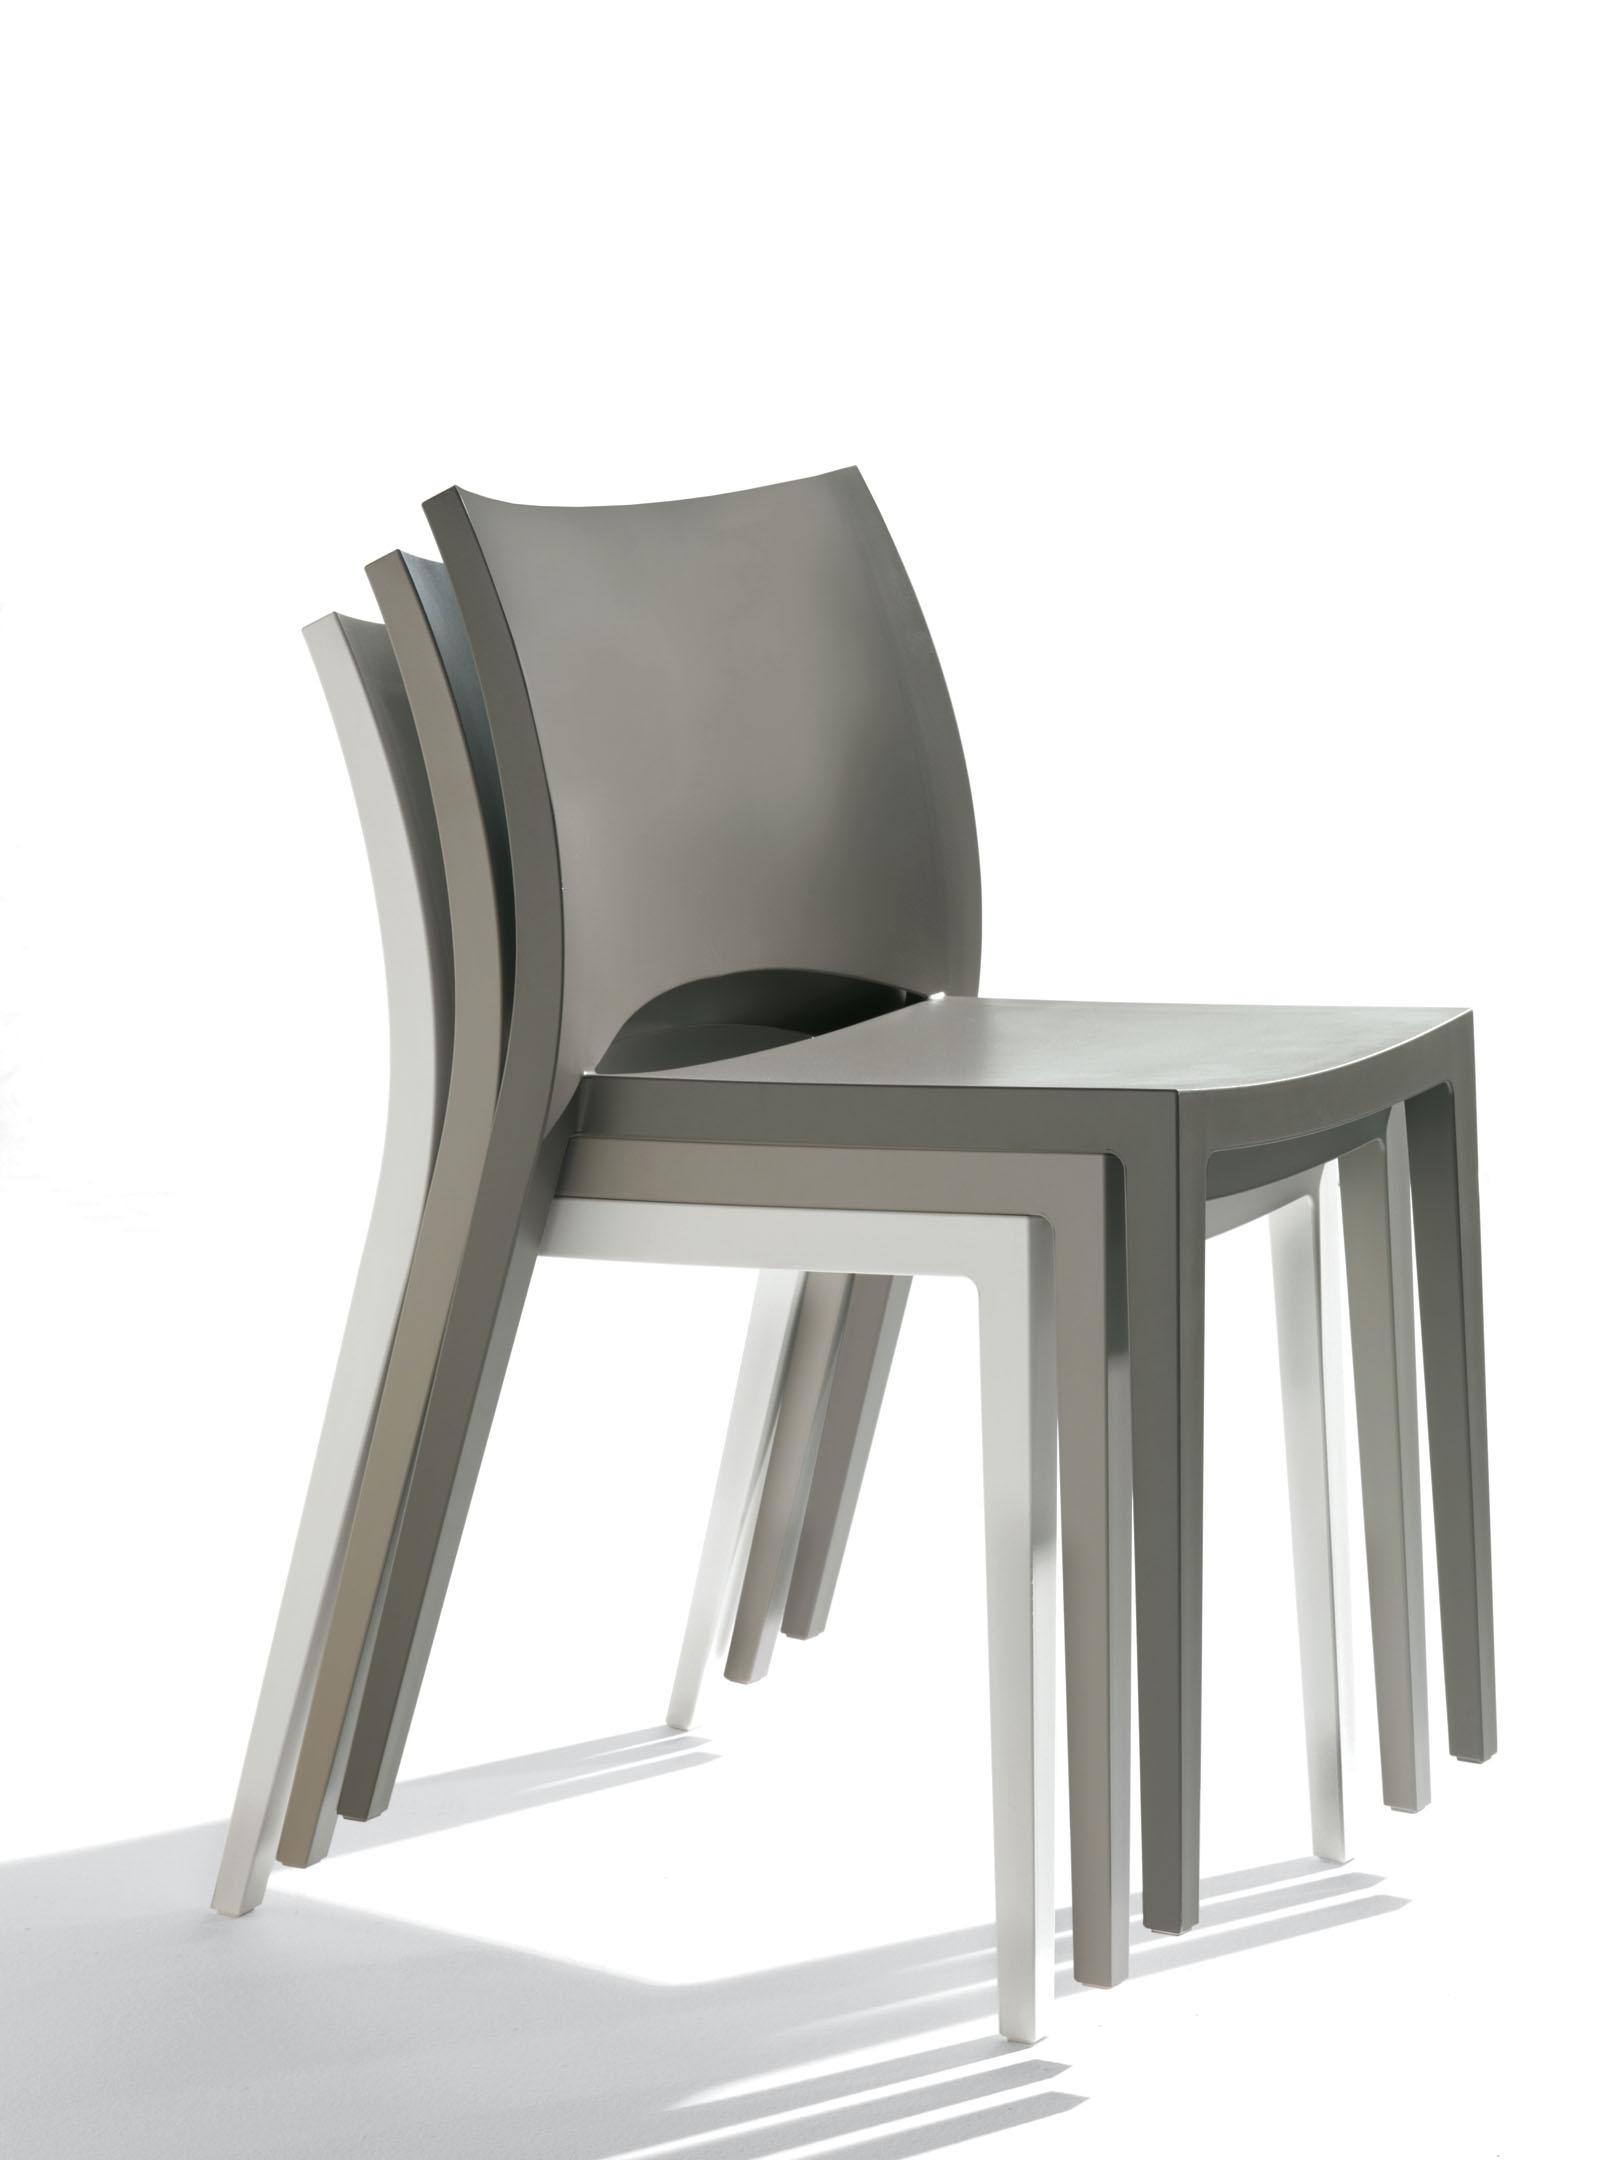 Sedie bontempi in offerta sedie a prezzi scontati for Sedie design outlet